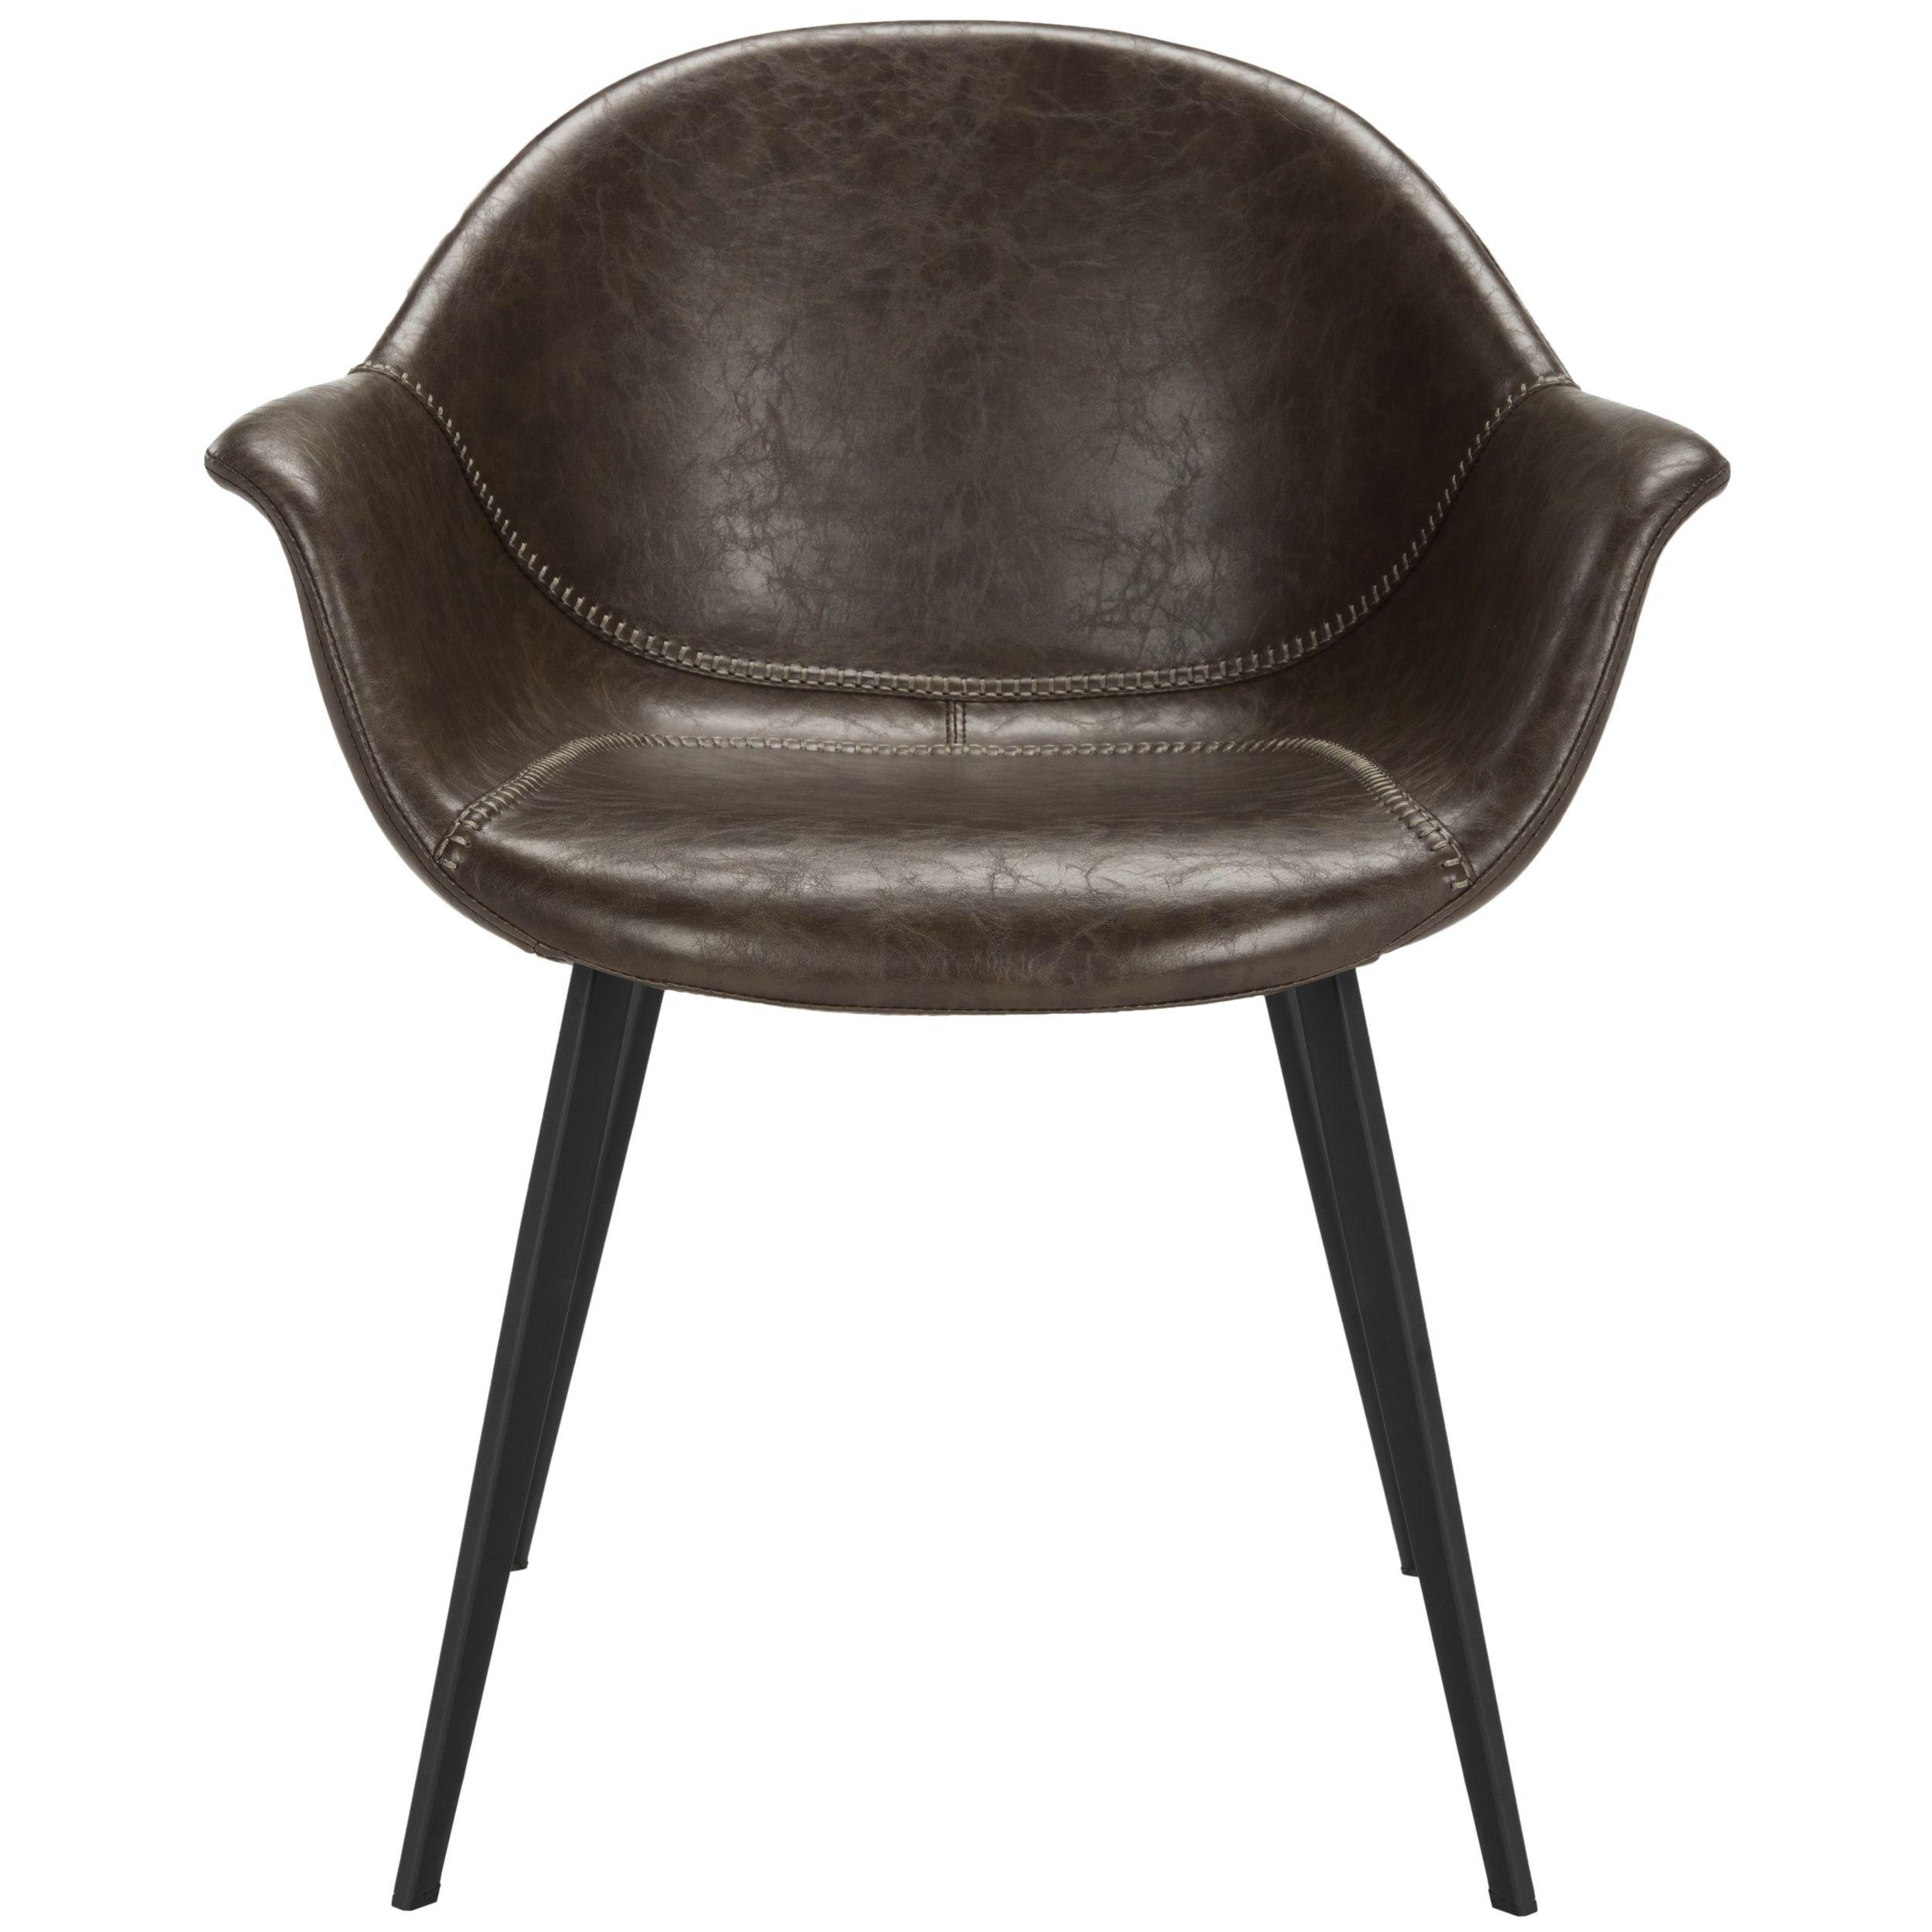 Outstanding Safavieh Dublin Mid Century Modern Leather Dining Tub Creativecarmelina Interior Chair Design Creativecarmelinacom